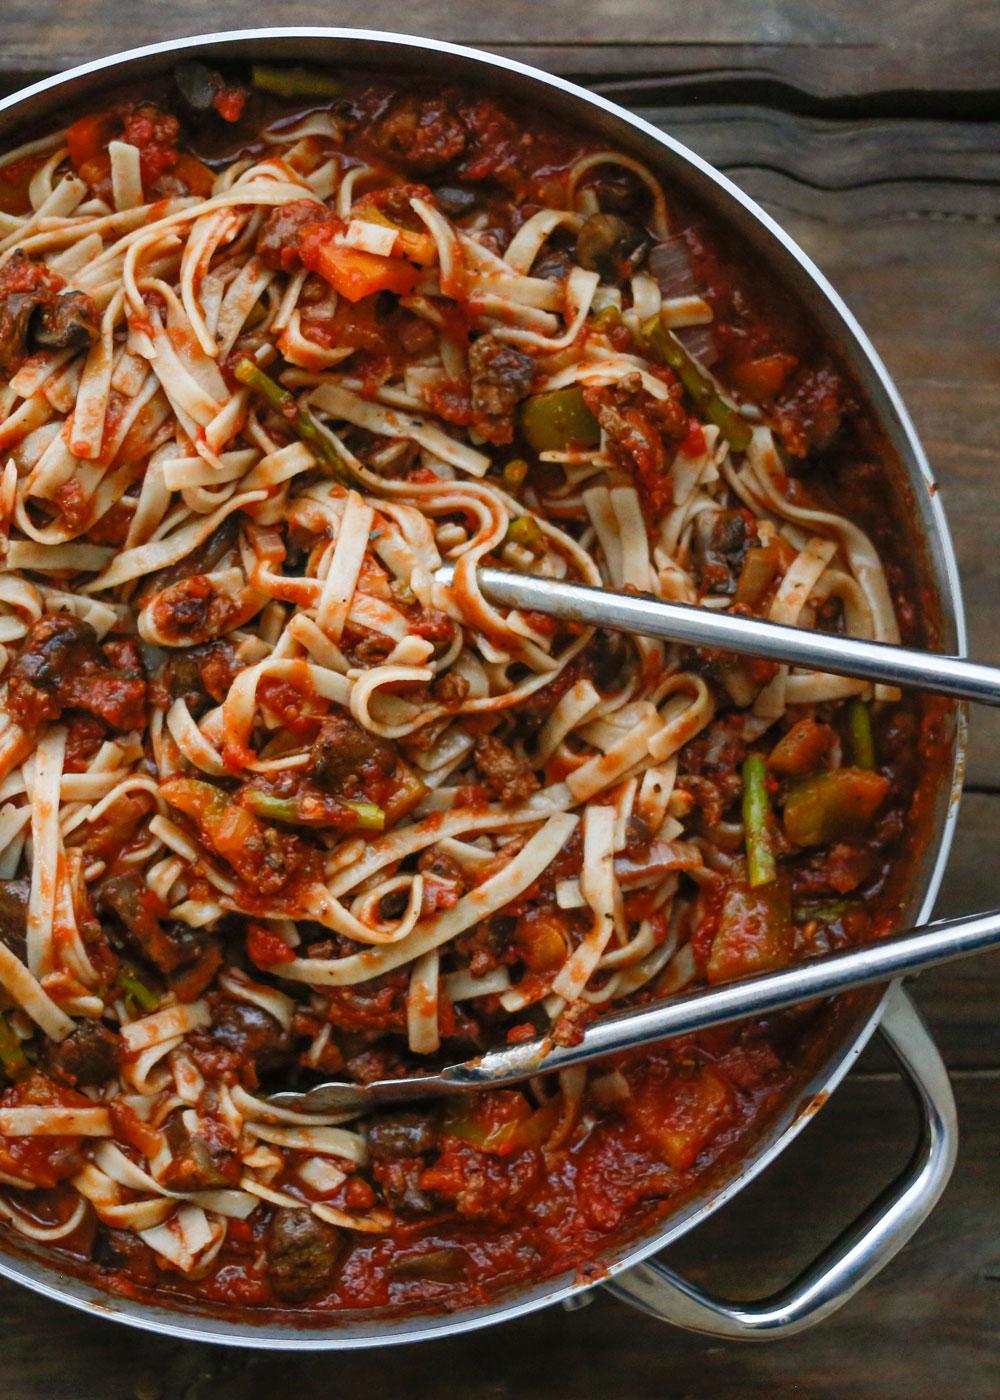 Vegetable Pasta | get the recipe at barefeetinthekitchen.com